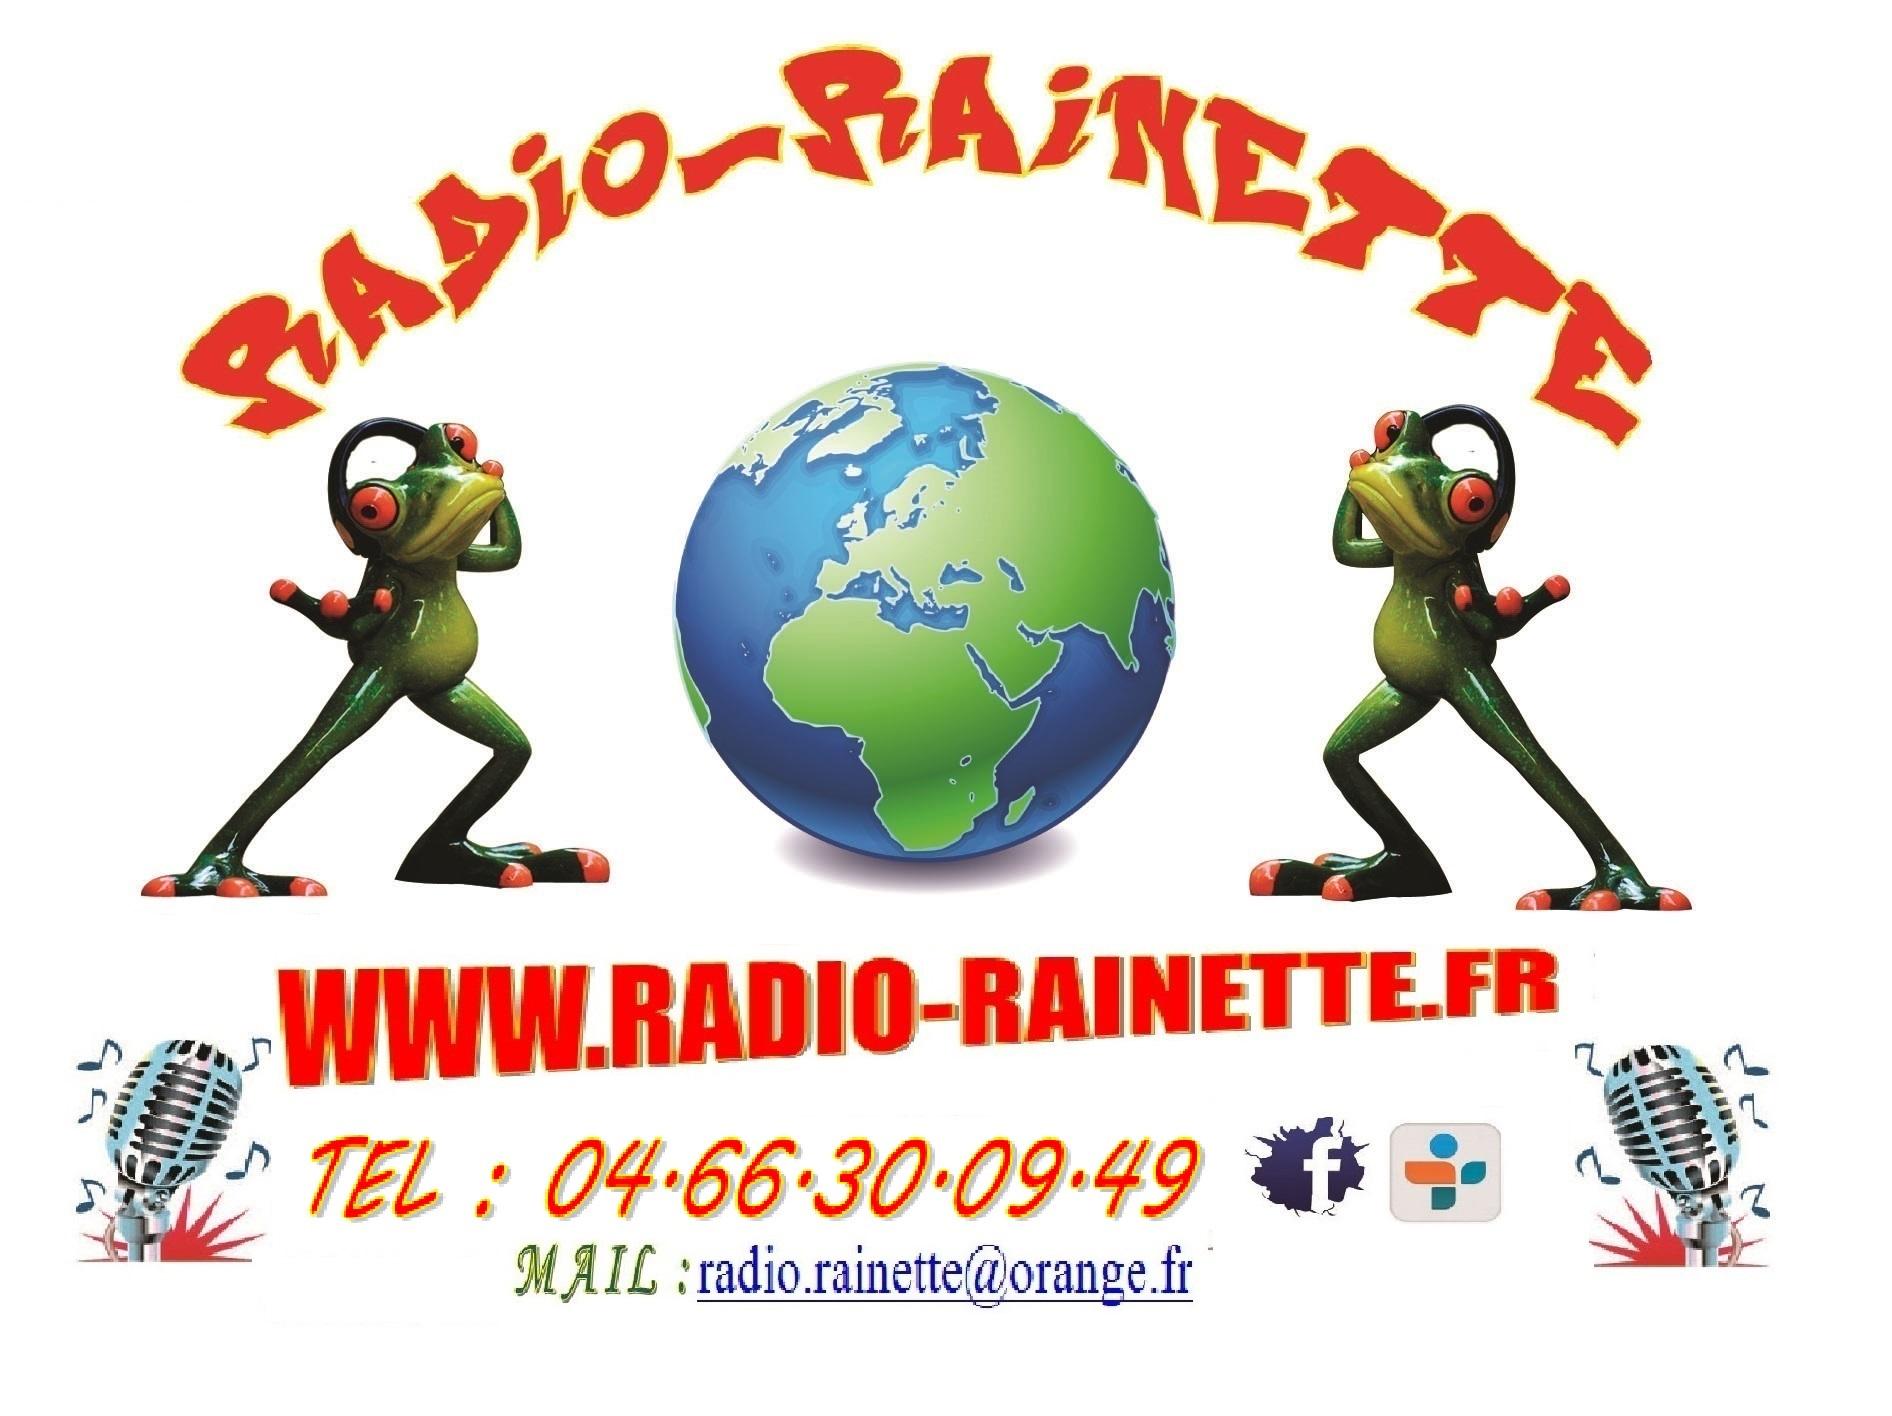 radiorainette